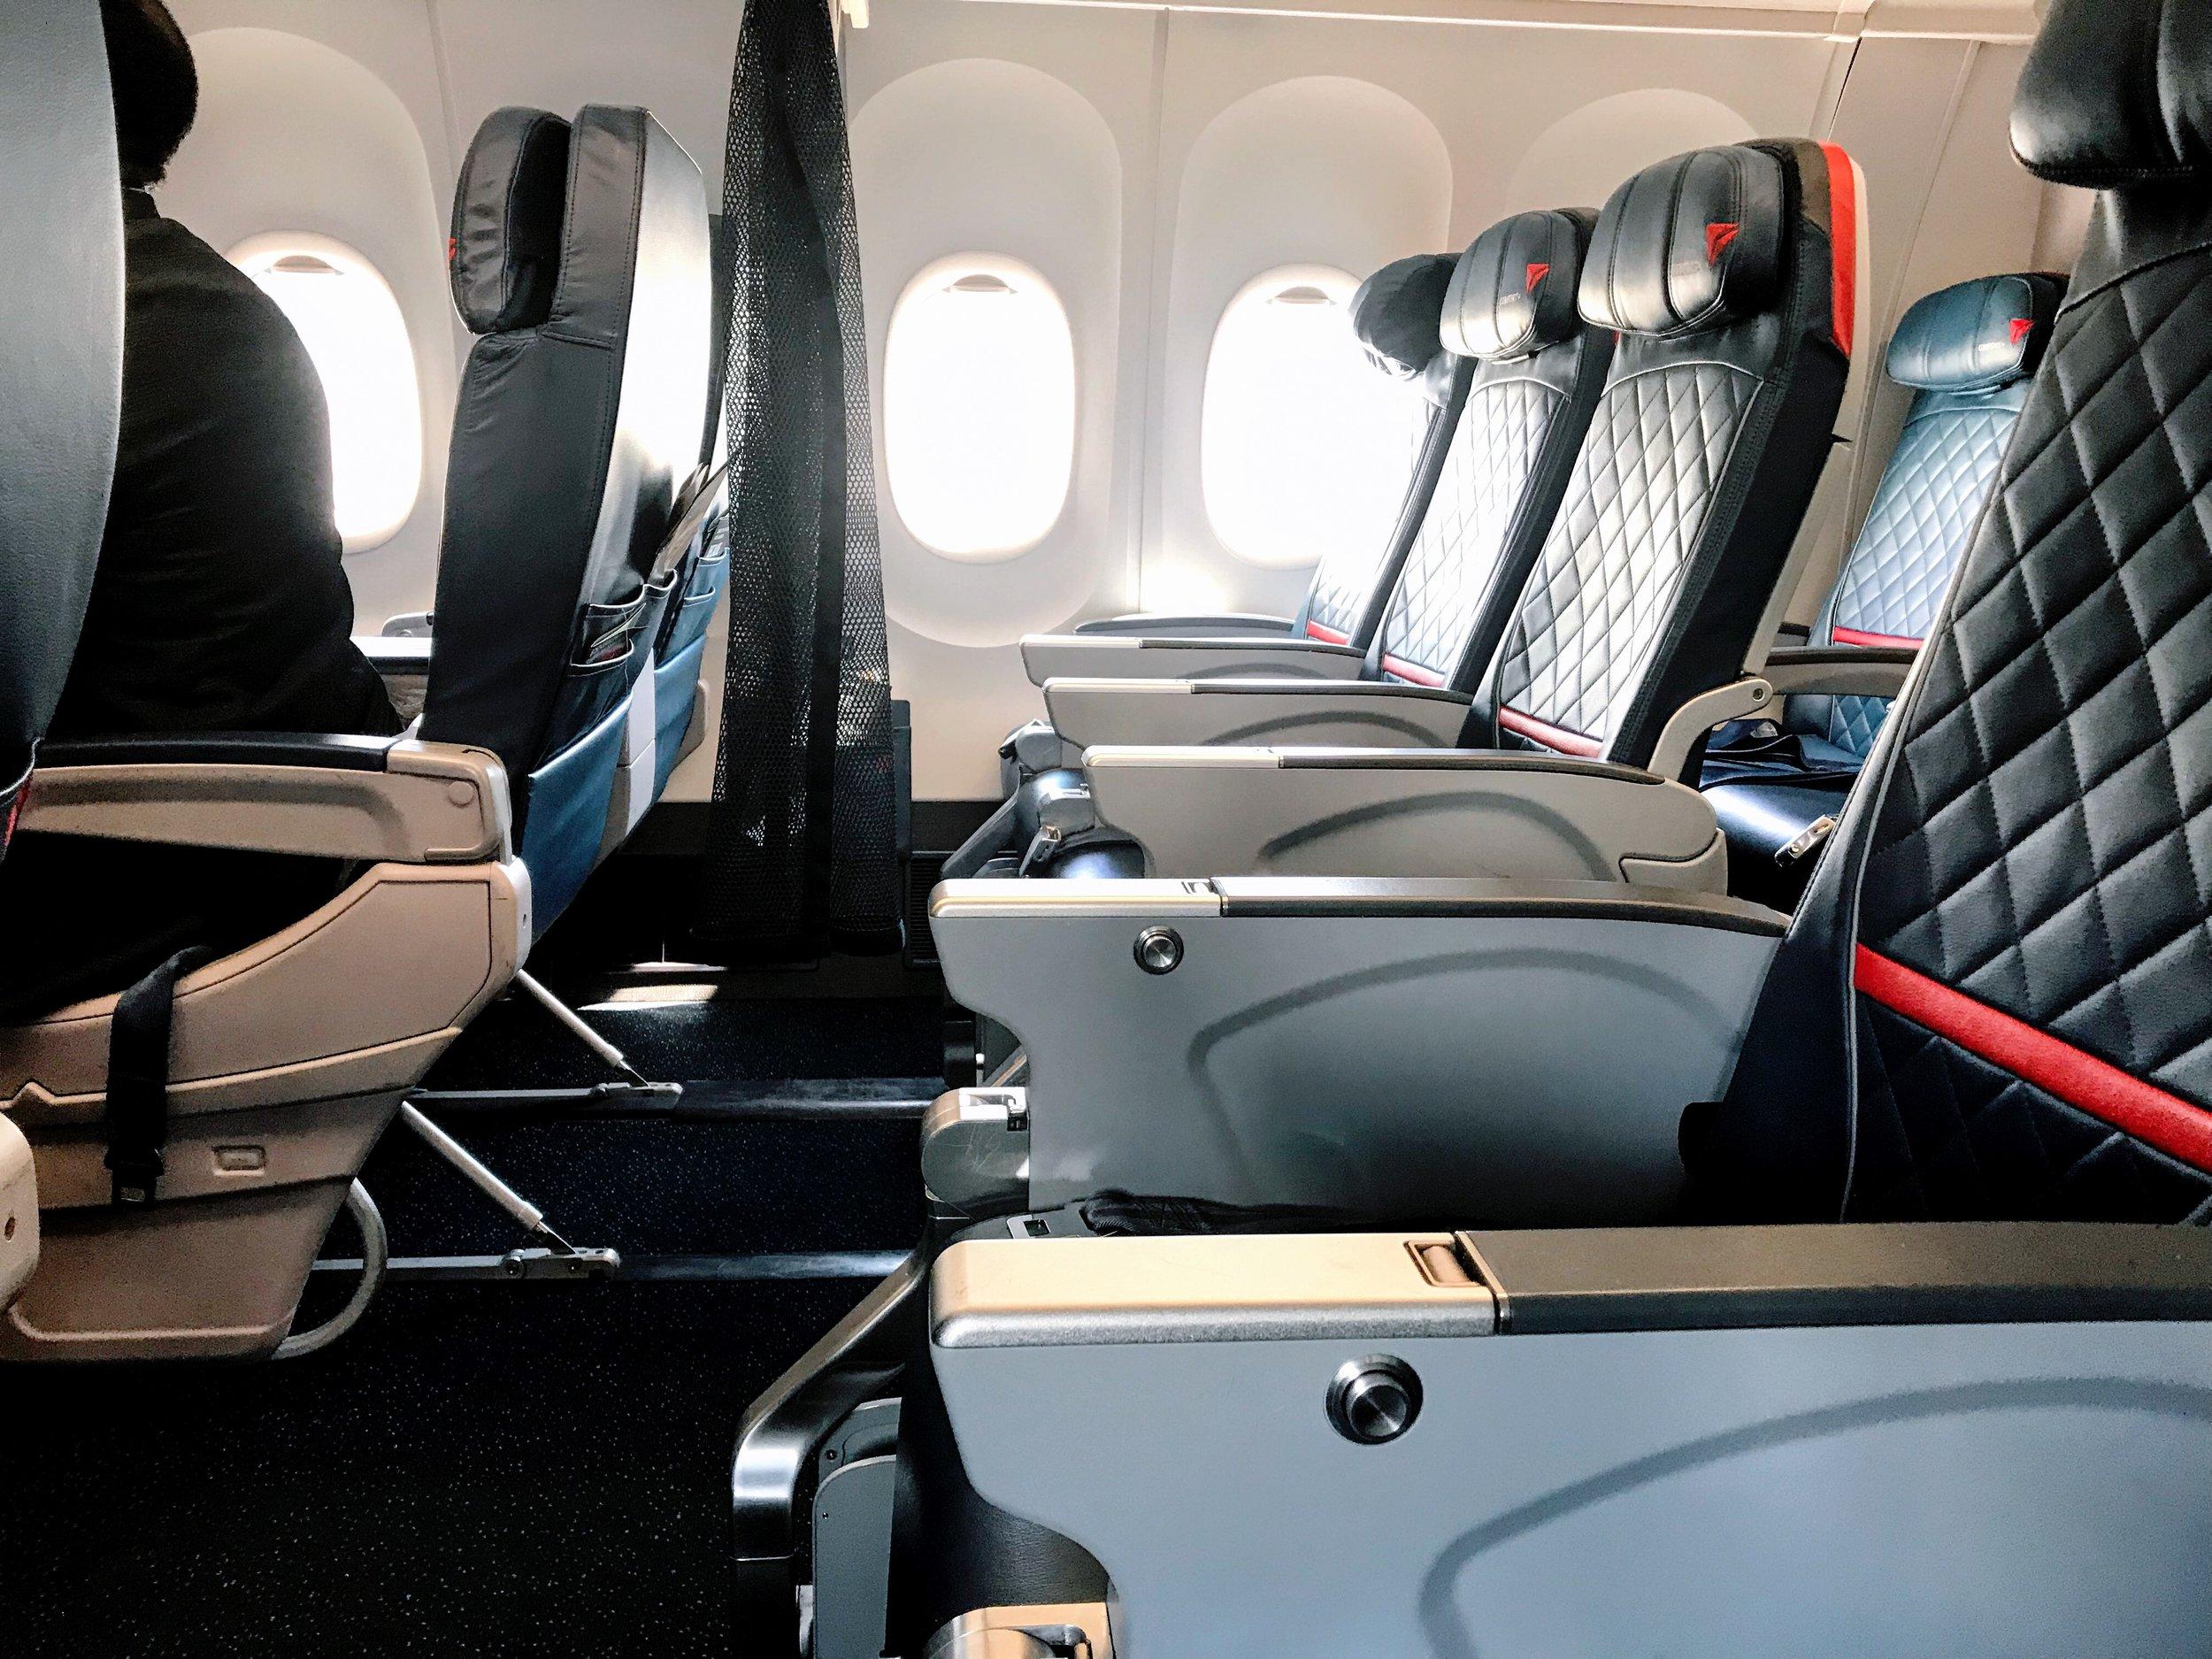 757-200 (75D) - First Class: 20 SeatsDelta Comfort+: 29 SeatsMain Cabin: 150 Seats